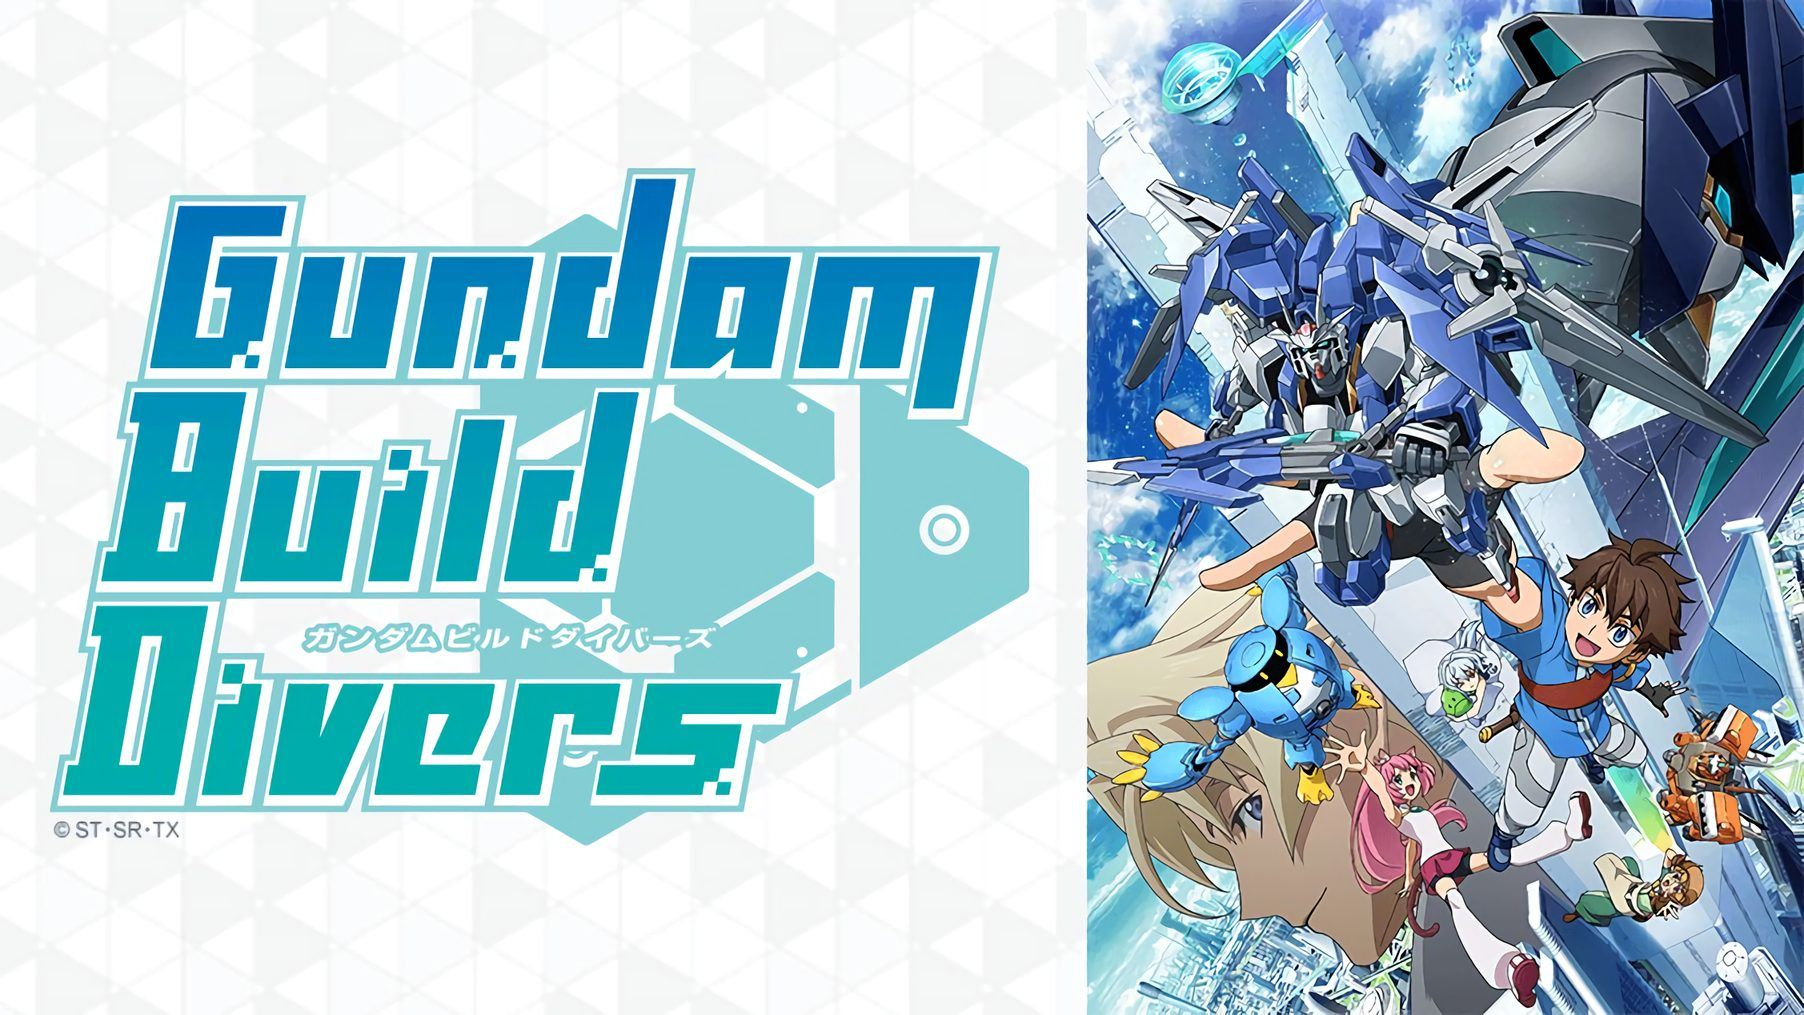 Gundam build divers 720p eng sub x265 10bit episode 08